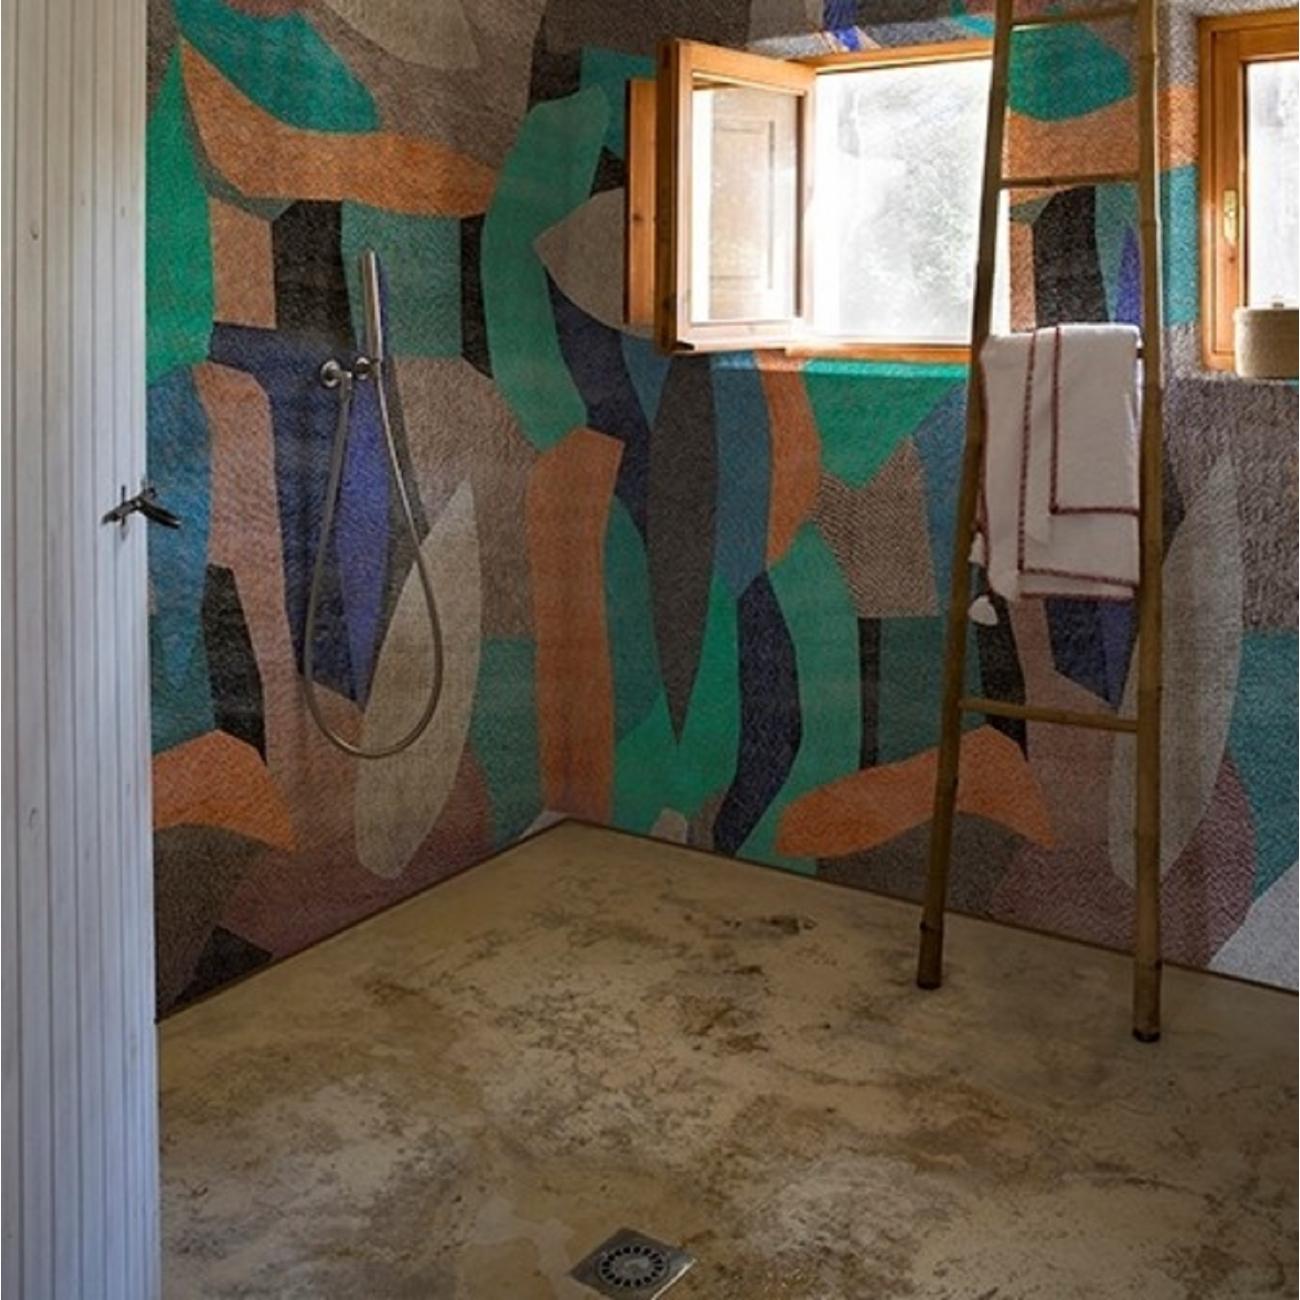 Esprit Art Deco Com wall & decò wet system esprit wallpaper - tattahome